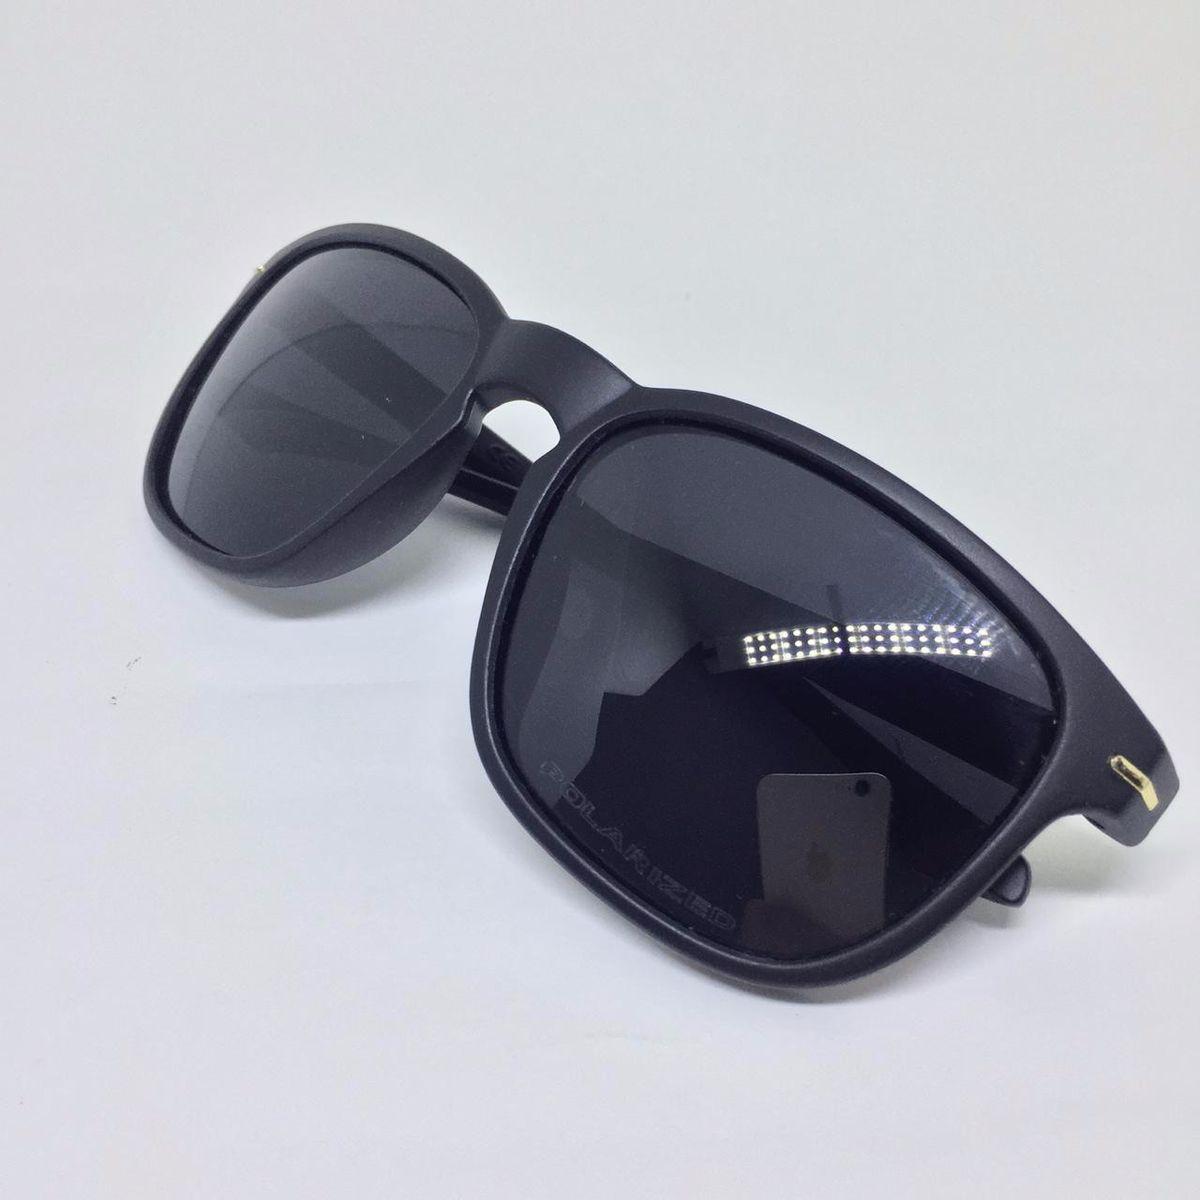 5a8f78ca5 Óculos de Sol Preto Oakley Original e Novo   Óculos Feminino Oakley Nunca  Usado 31310530   enjoei